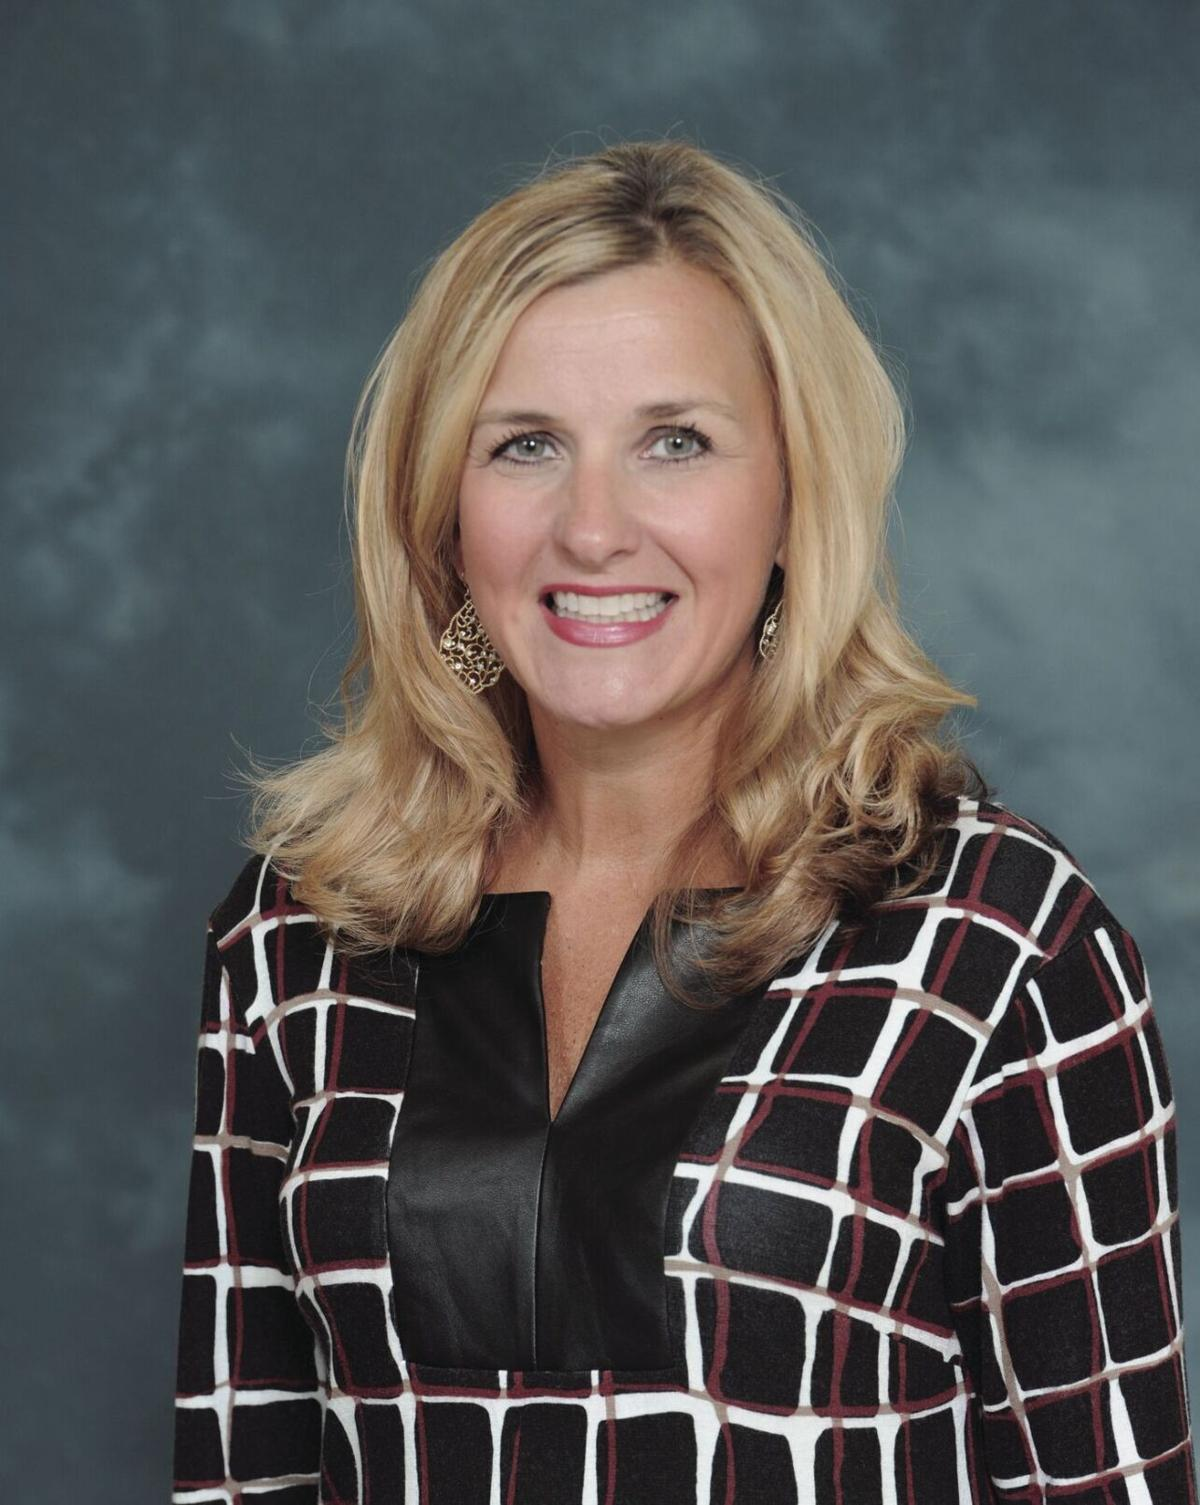 School board extends Rhodes' contract